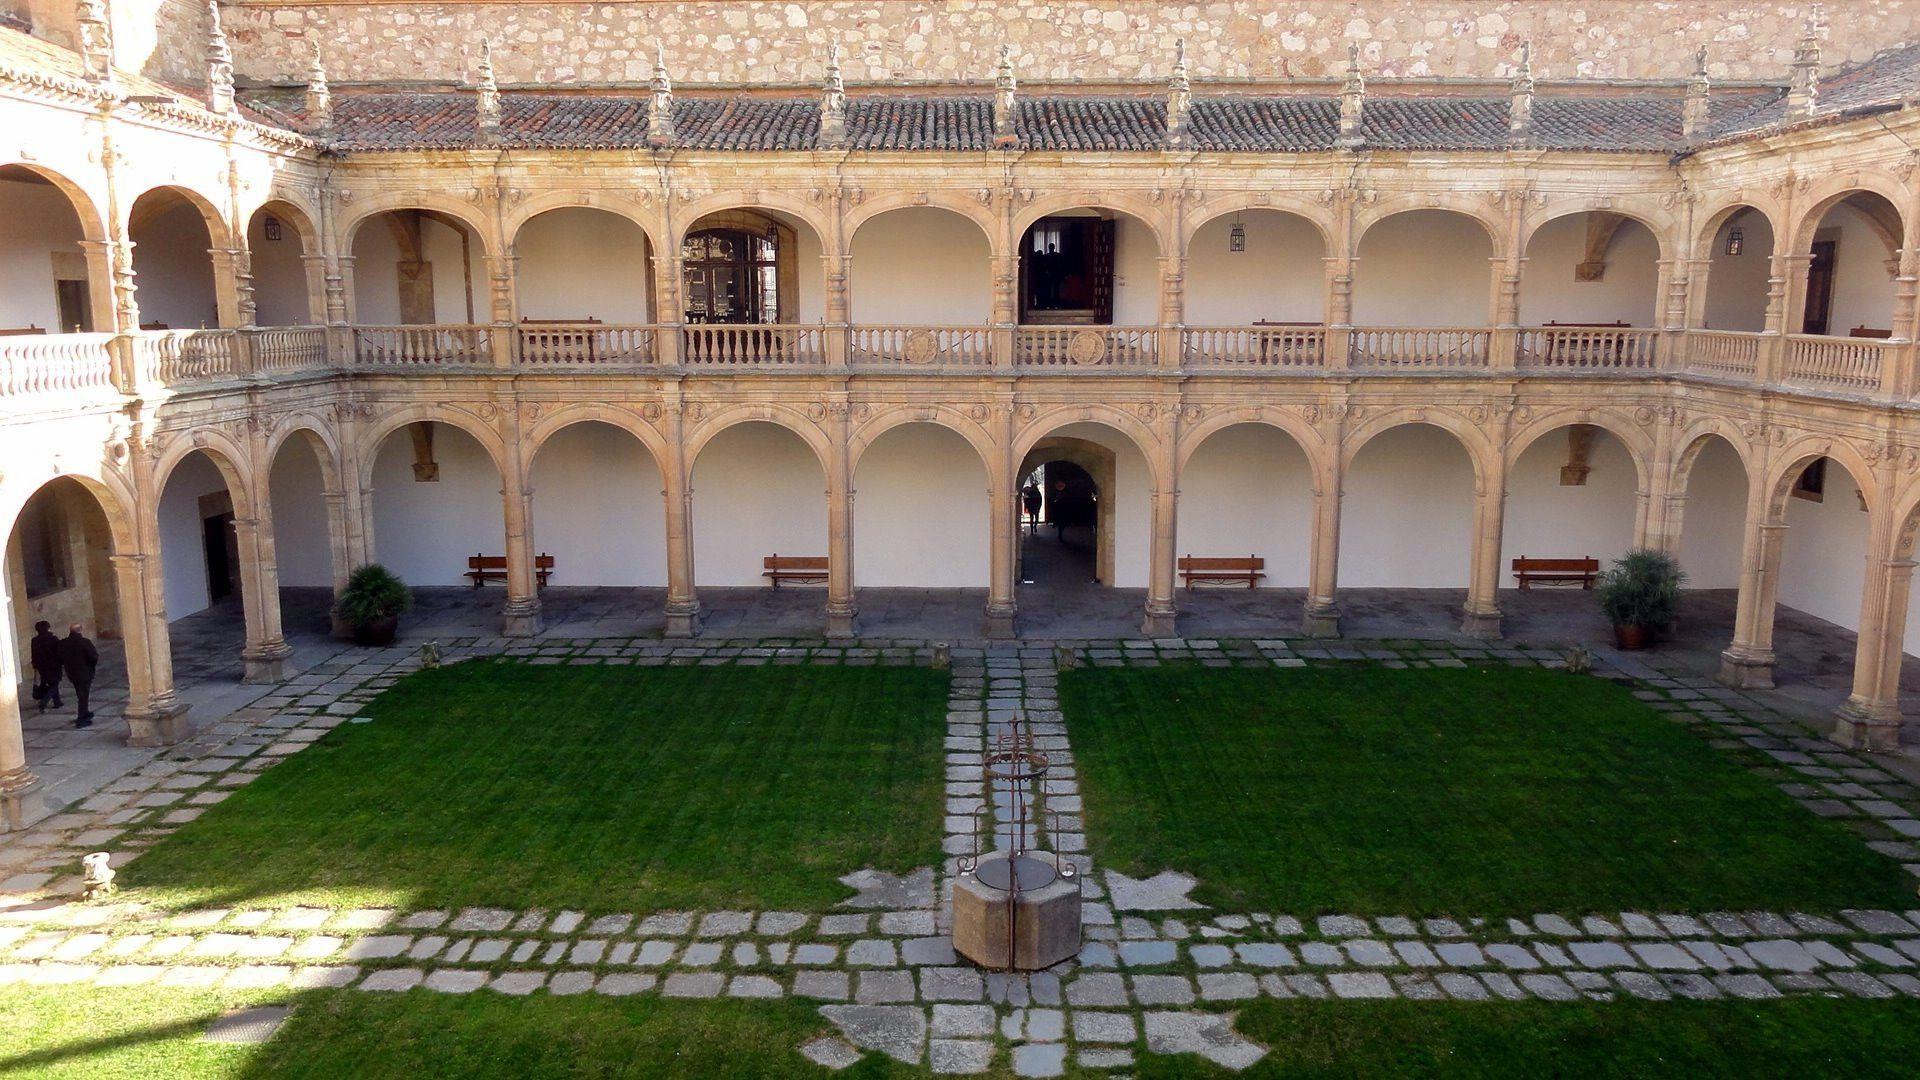 La fundaci n general de la usal organiza una reuni n sobre for Salamanca 24 horas